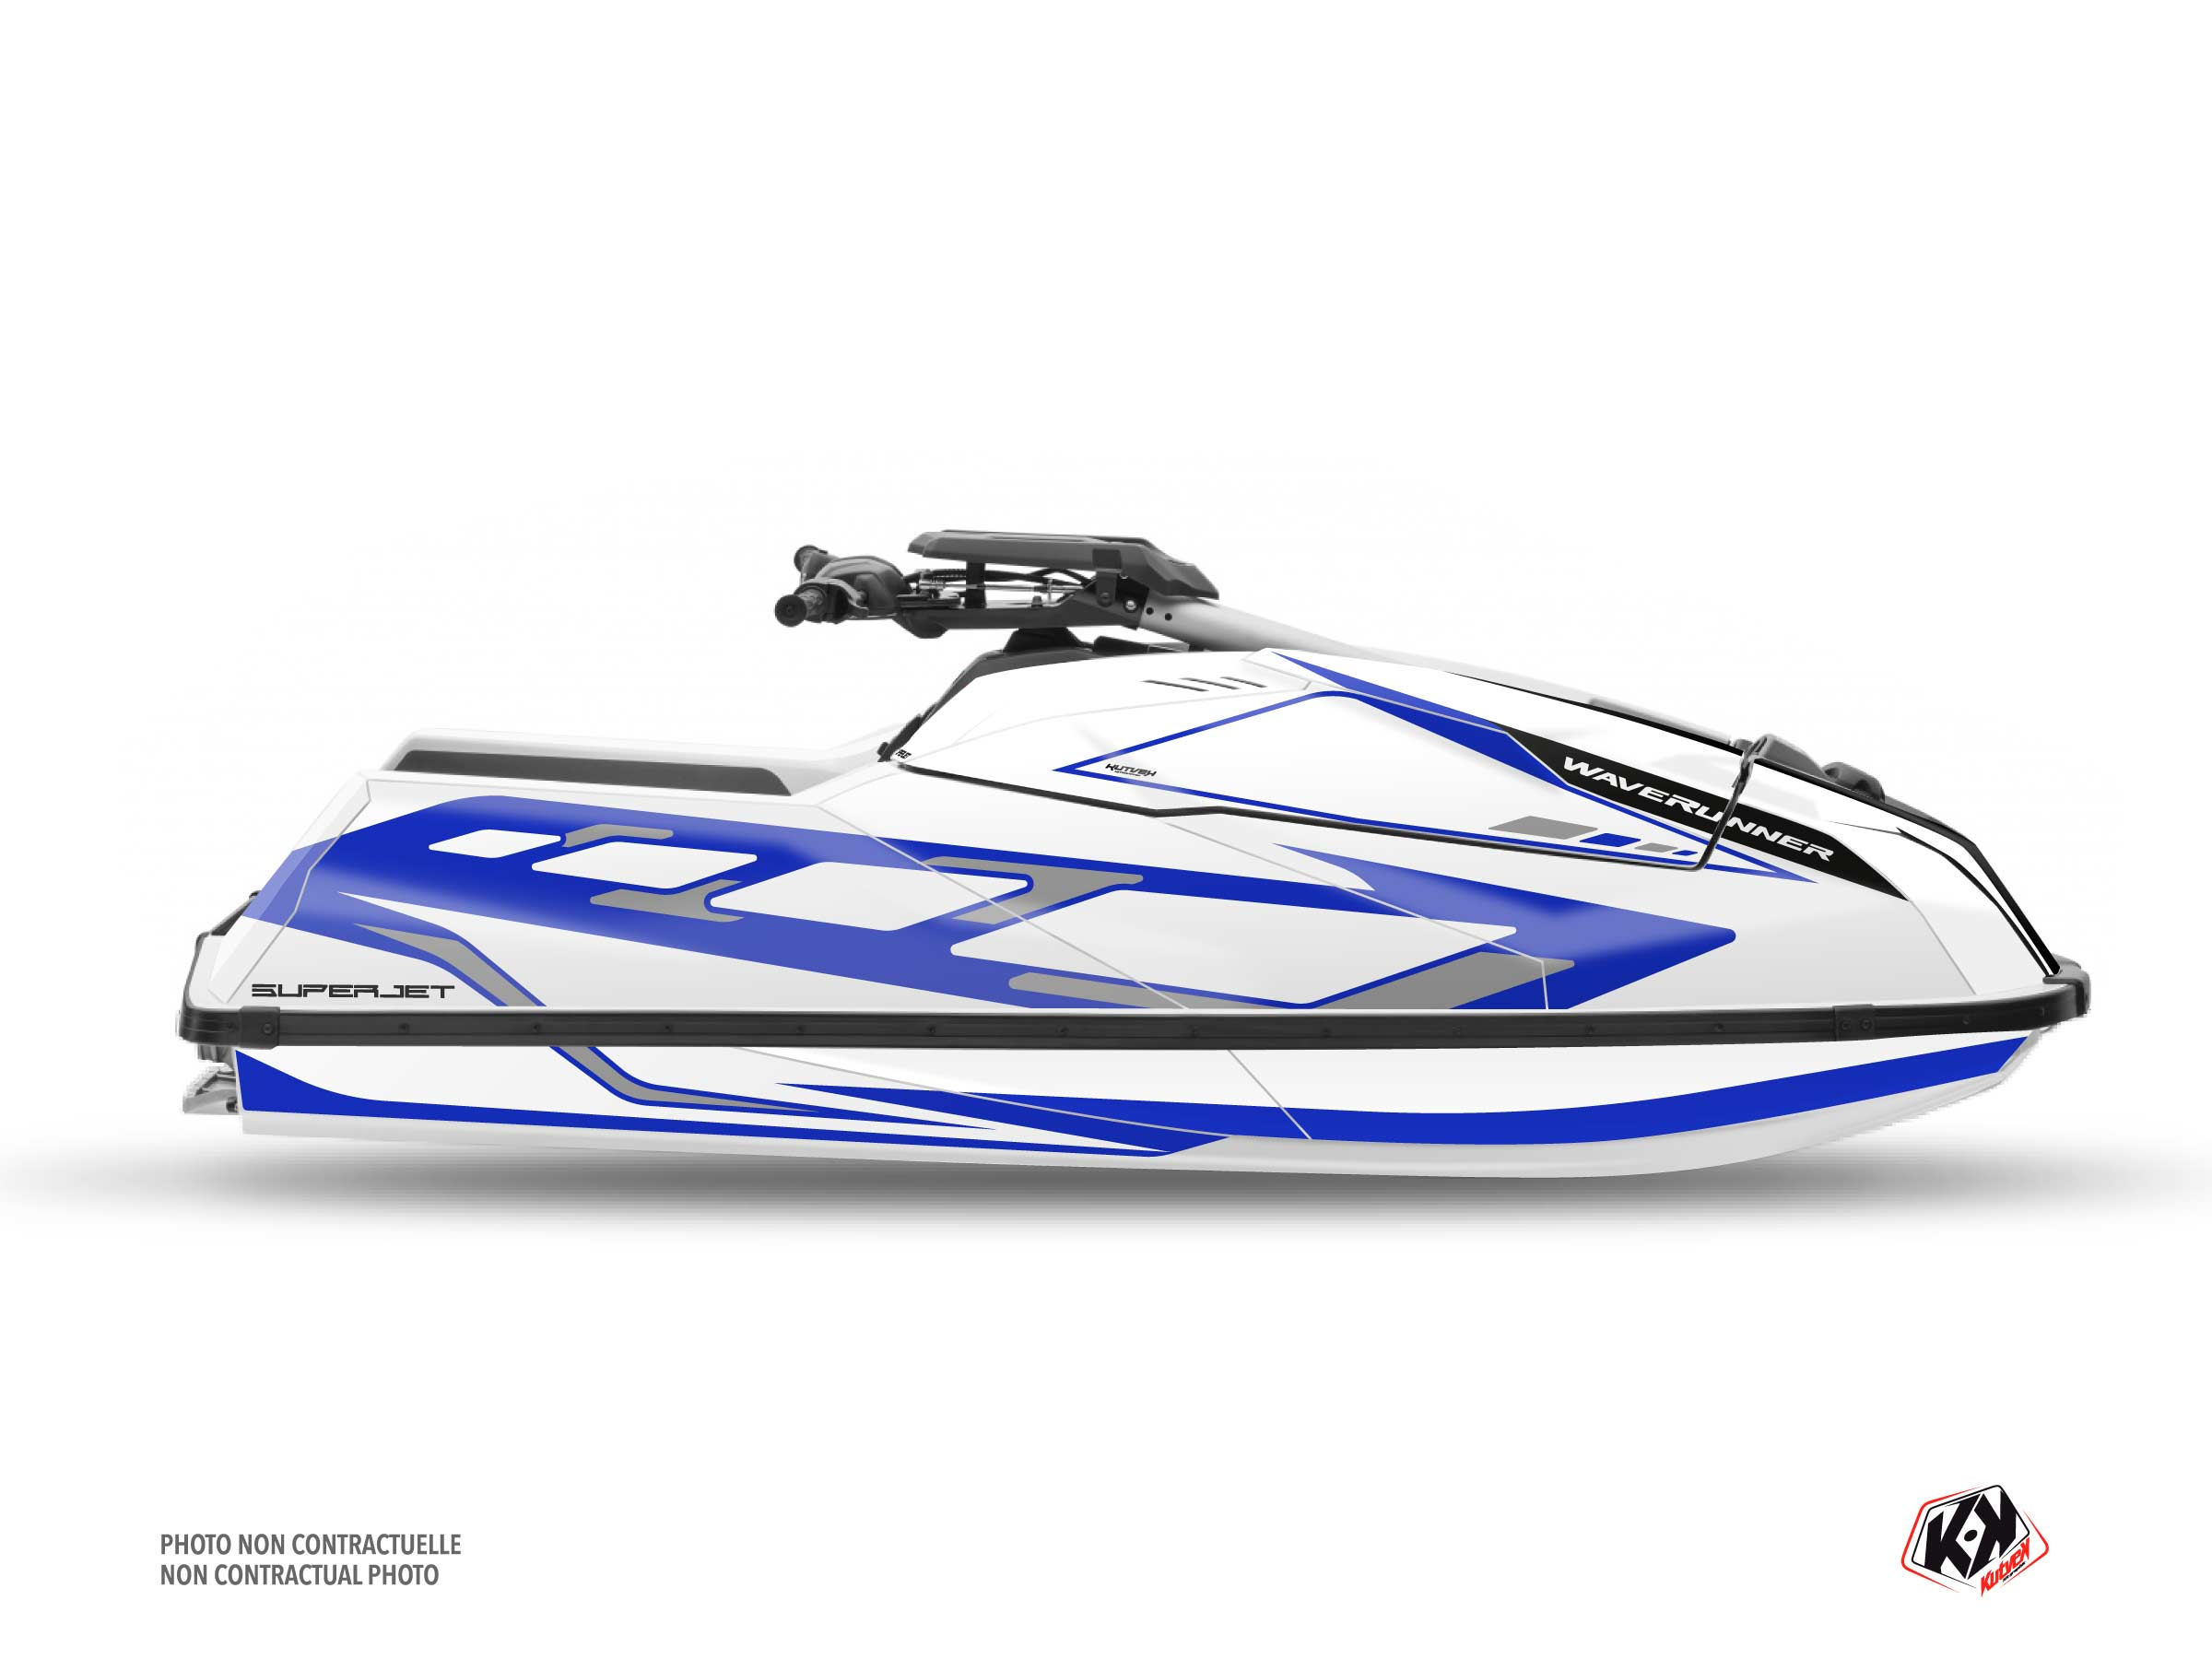 Kit Déco Jet-Ski FLAGSHIP Yamaha Superjet 2021 Blanc